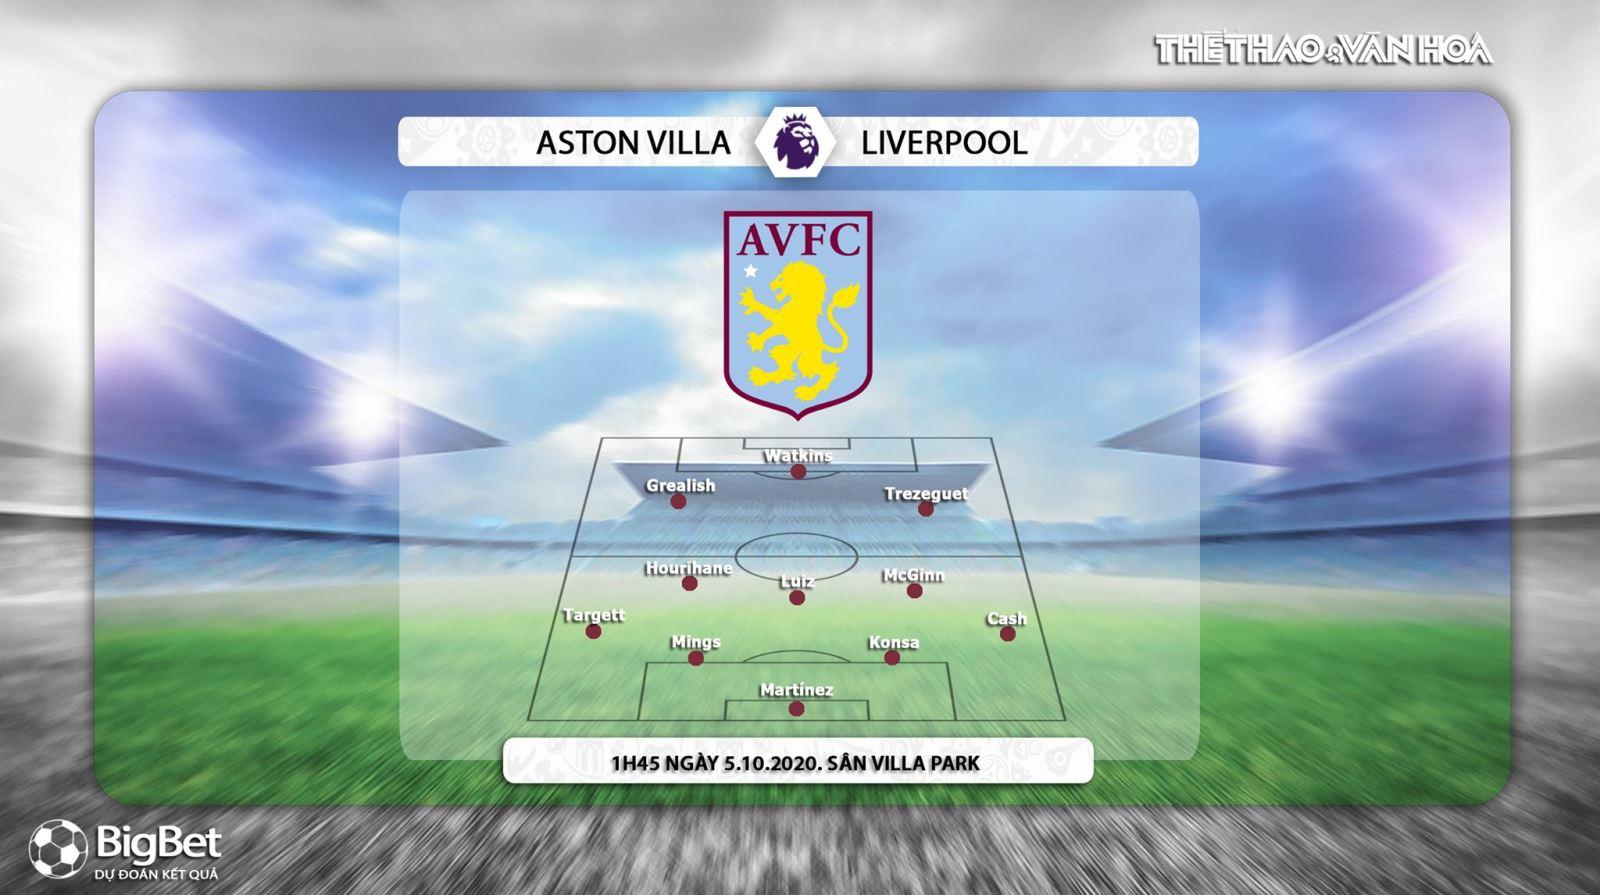 Aston Villa vs Liverpool, soi kèo, kèo bóng đá, soi kèo Aston Villa vs Liverpool, dự đoán Aston Villa vs Liverpool, trực tiếp Aston Villa vs Liverpool, Aston Villa, Liverpool